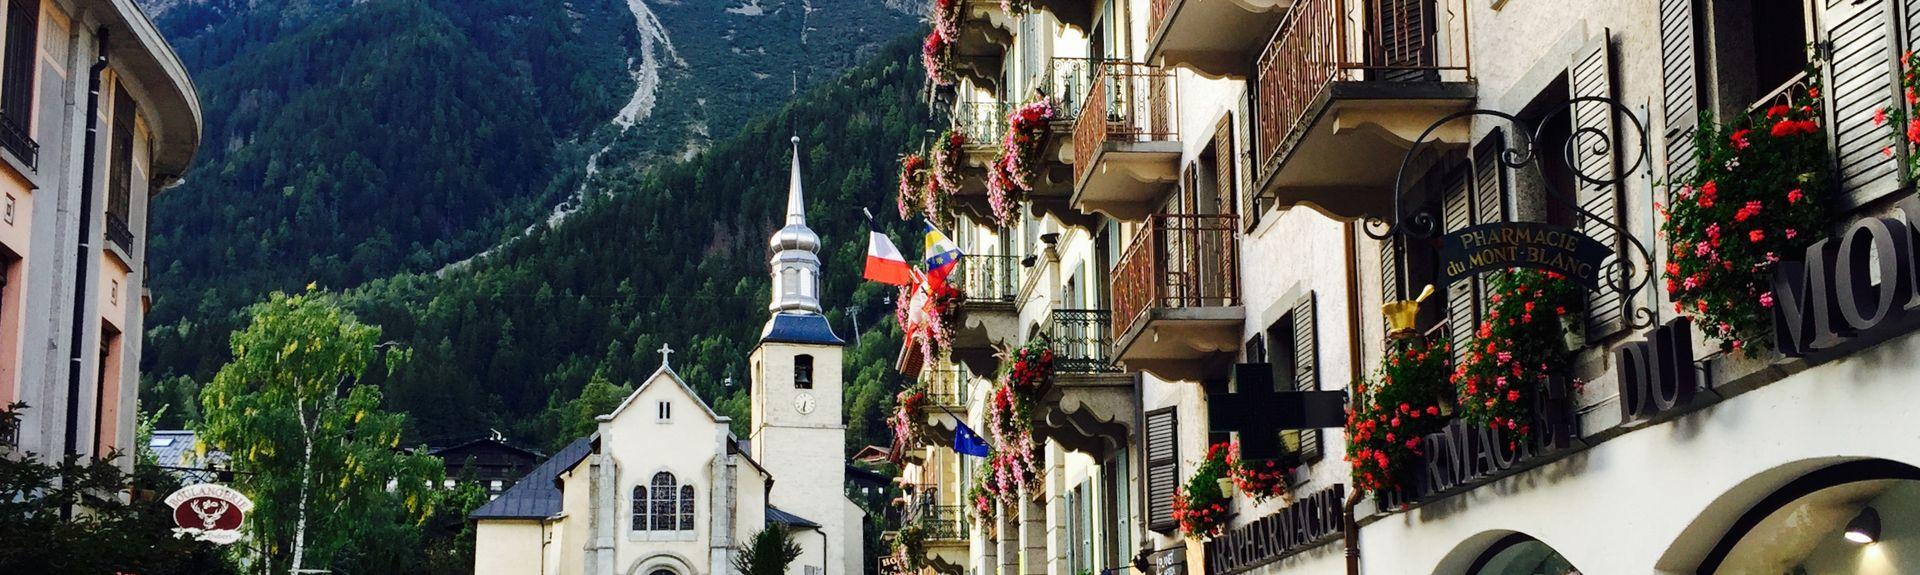 Chamonix-Mont-Blanc, Alvernia-Rodano-Alpi, Francia